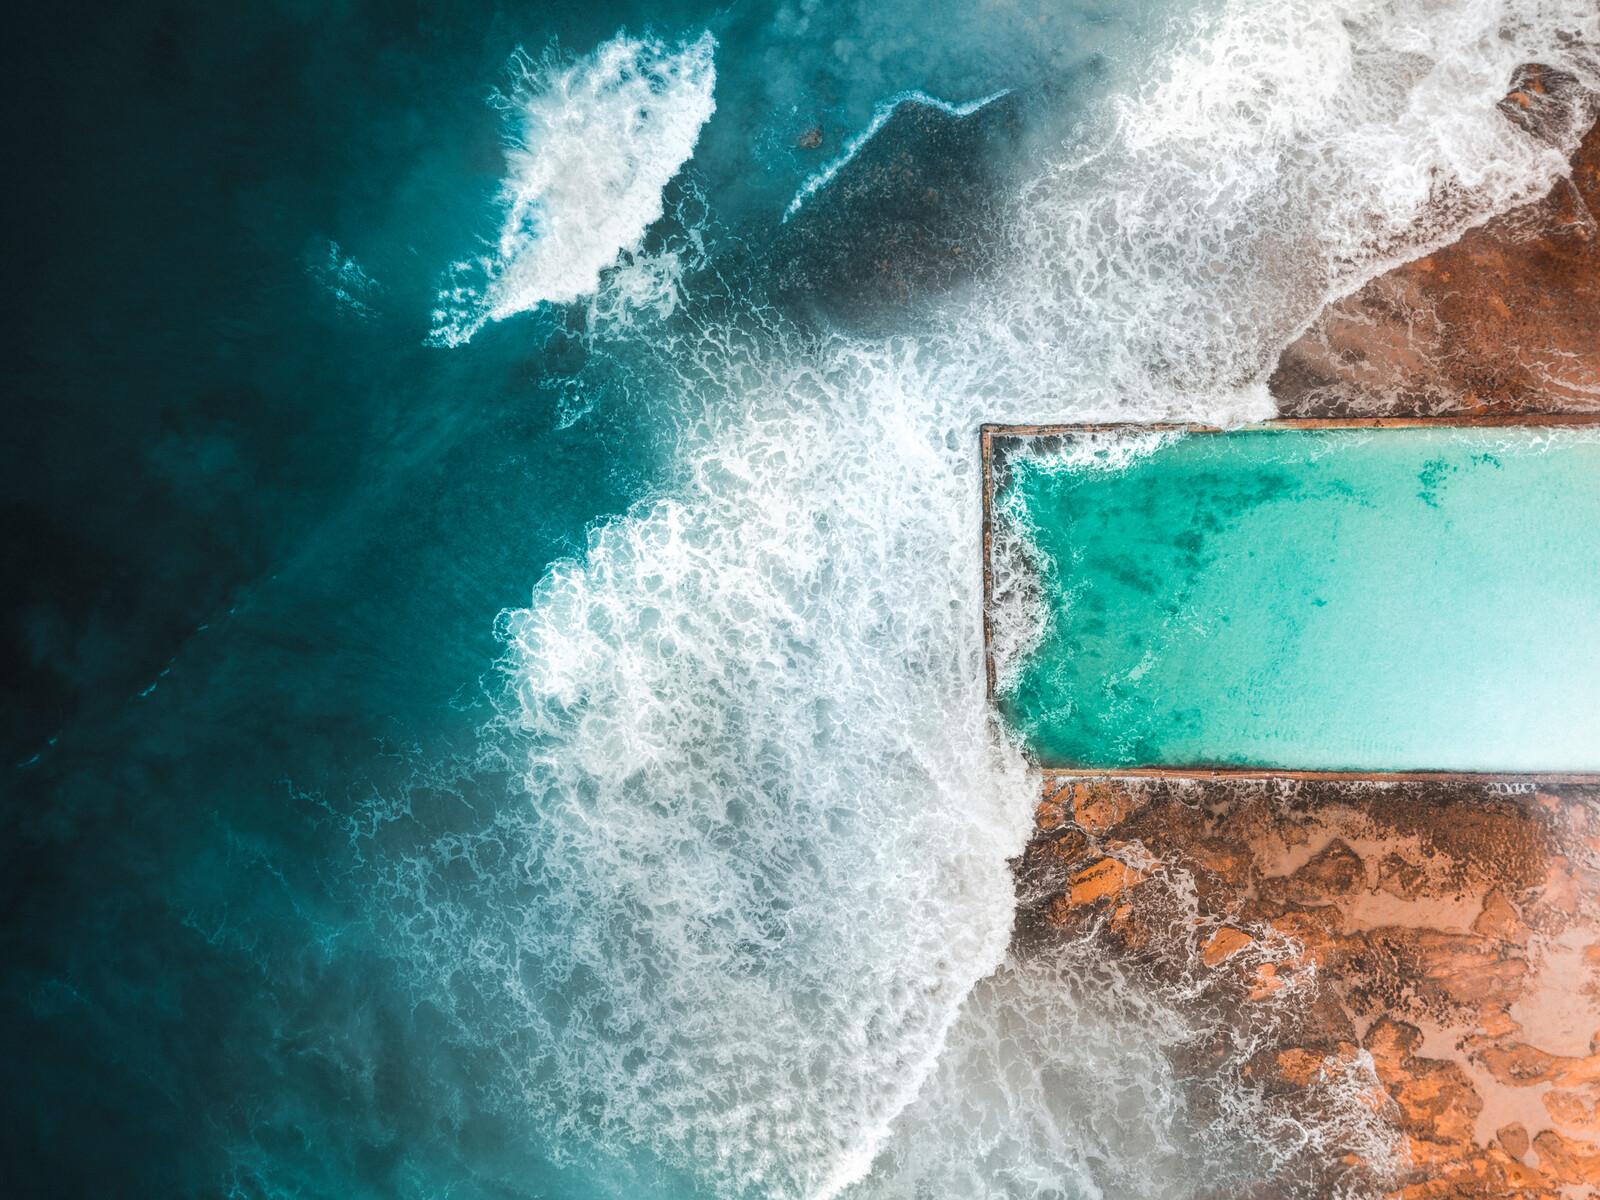 Cronulla Rock Pool 02 - Peter Yan